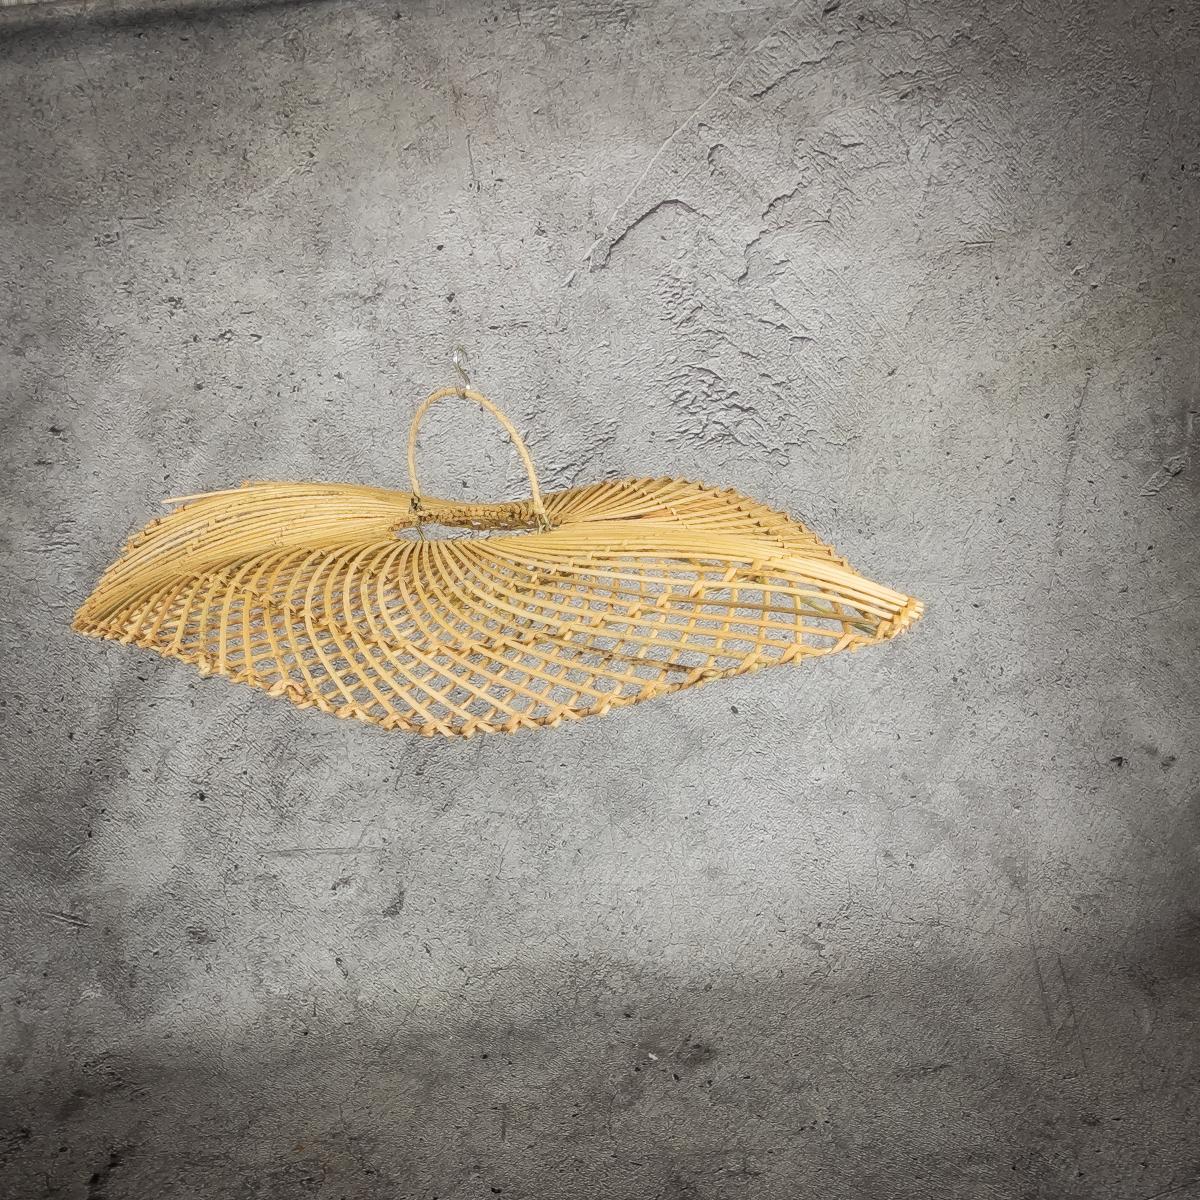 Lampara de rattan Oval Pleyok de 80cm